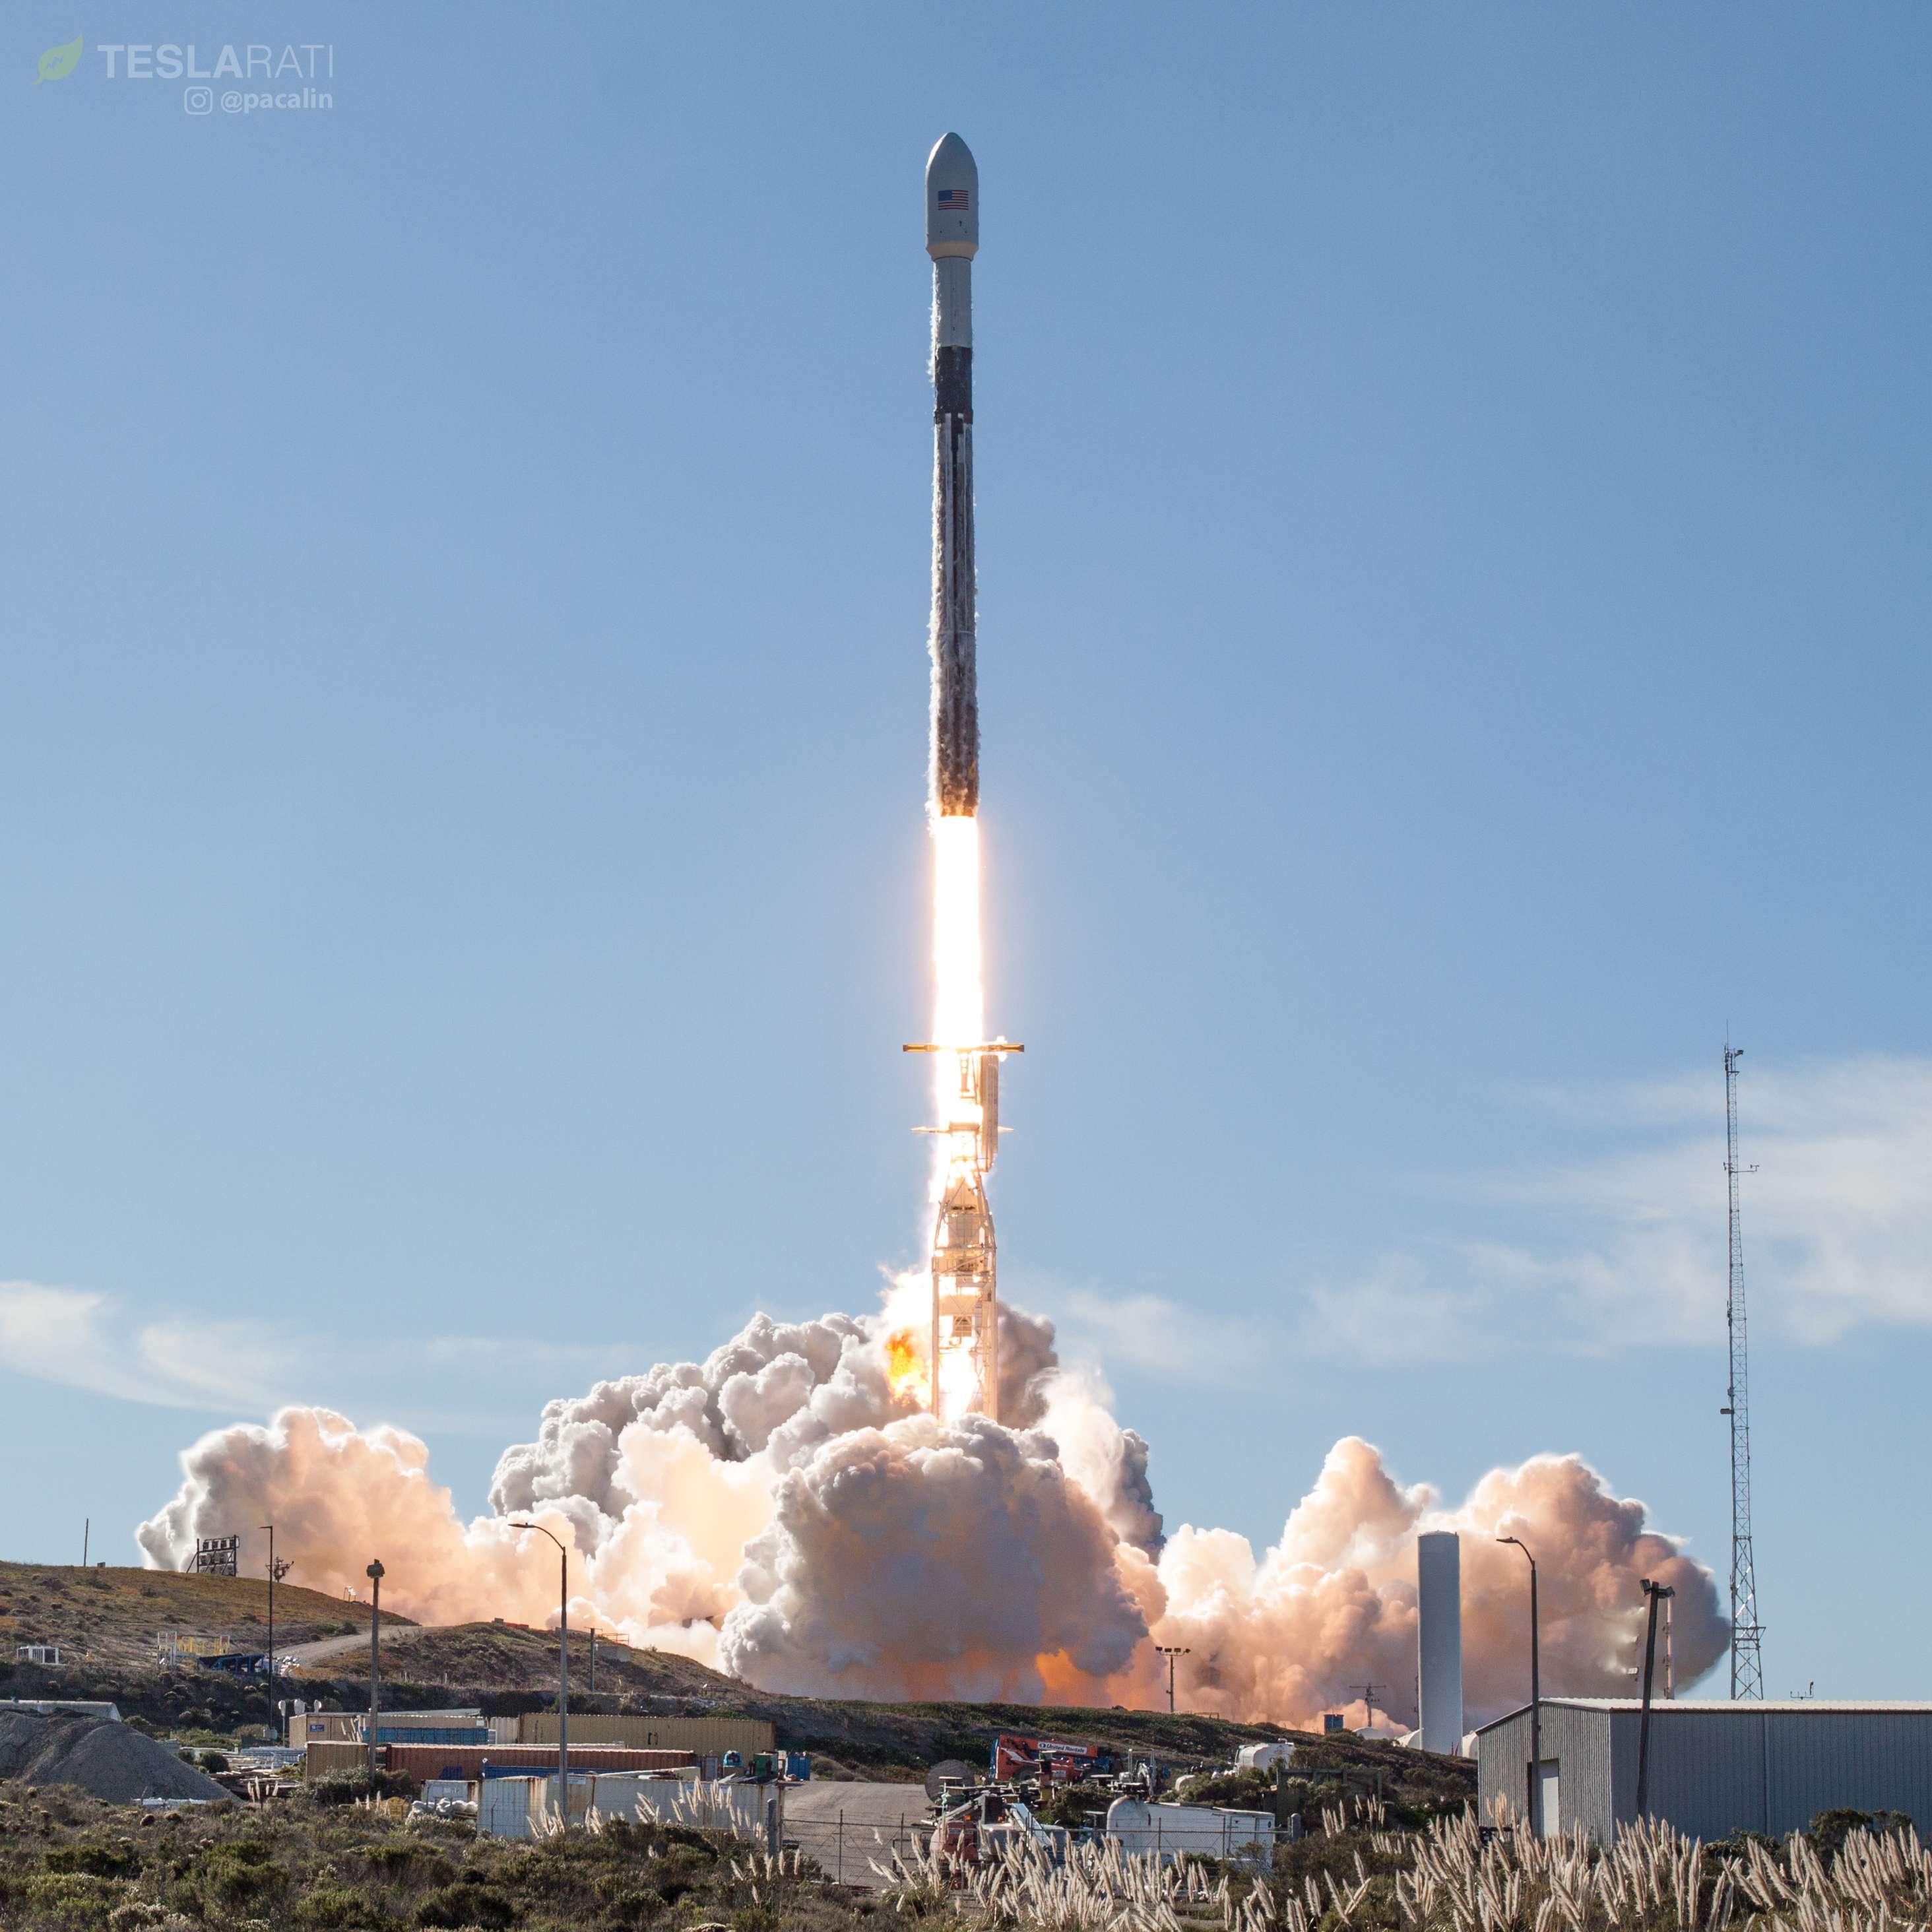 Falcon 9 B1046 SSO-A liftoff (Pauline Acalin) 2(c)